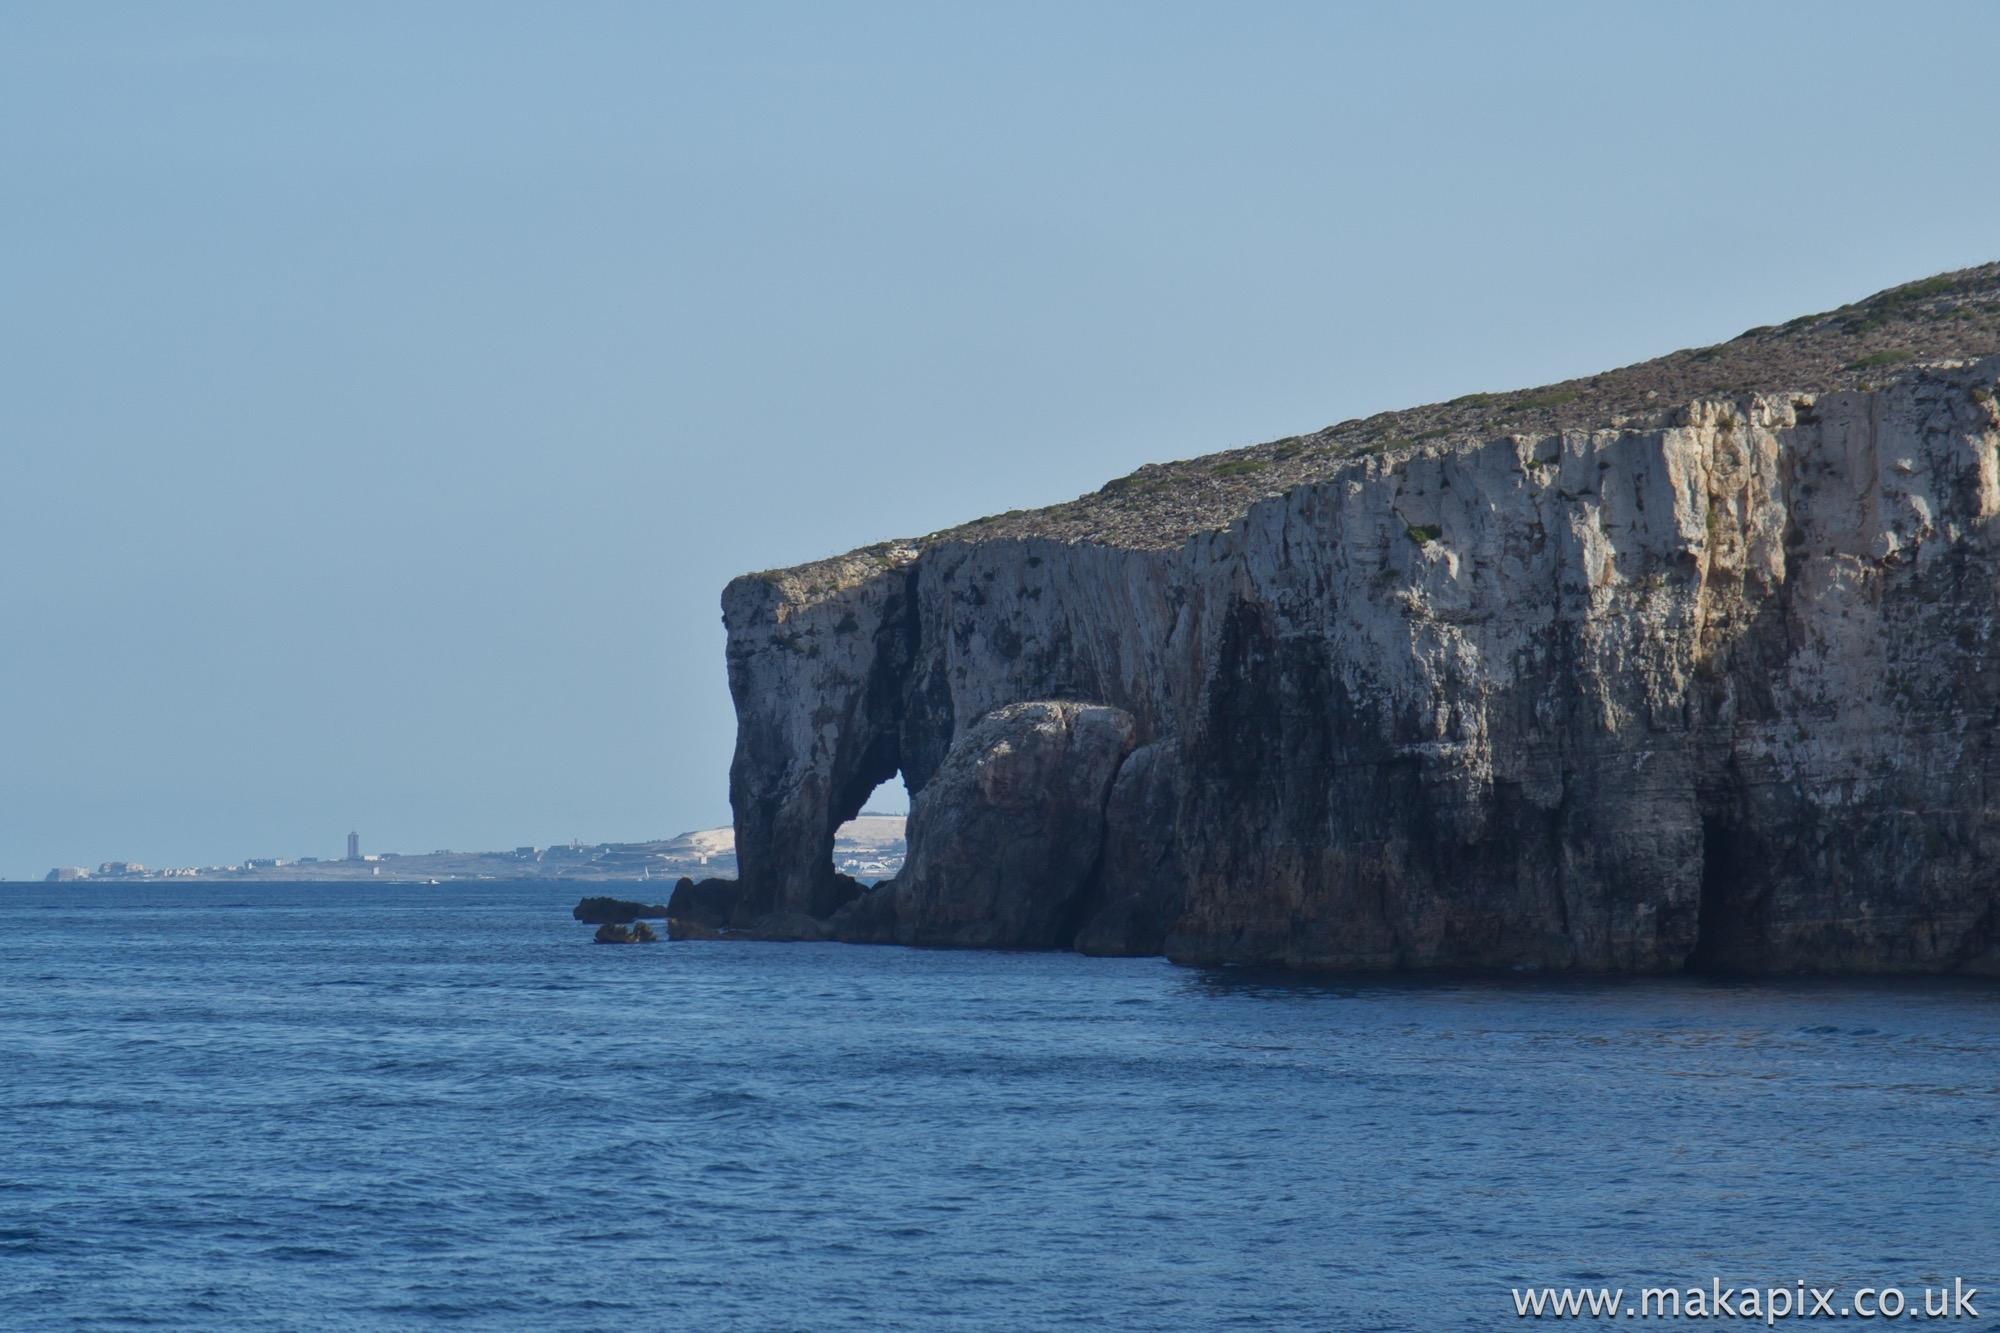 Malta-Comino Elephant 2014